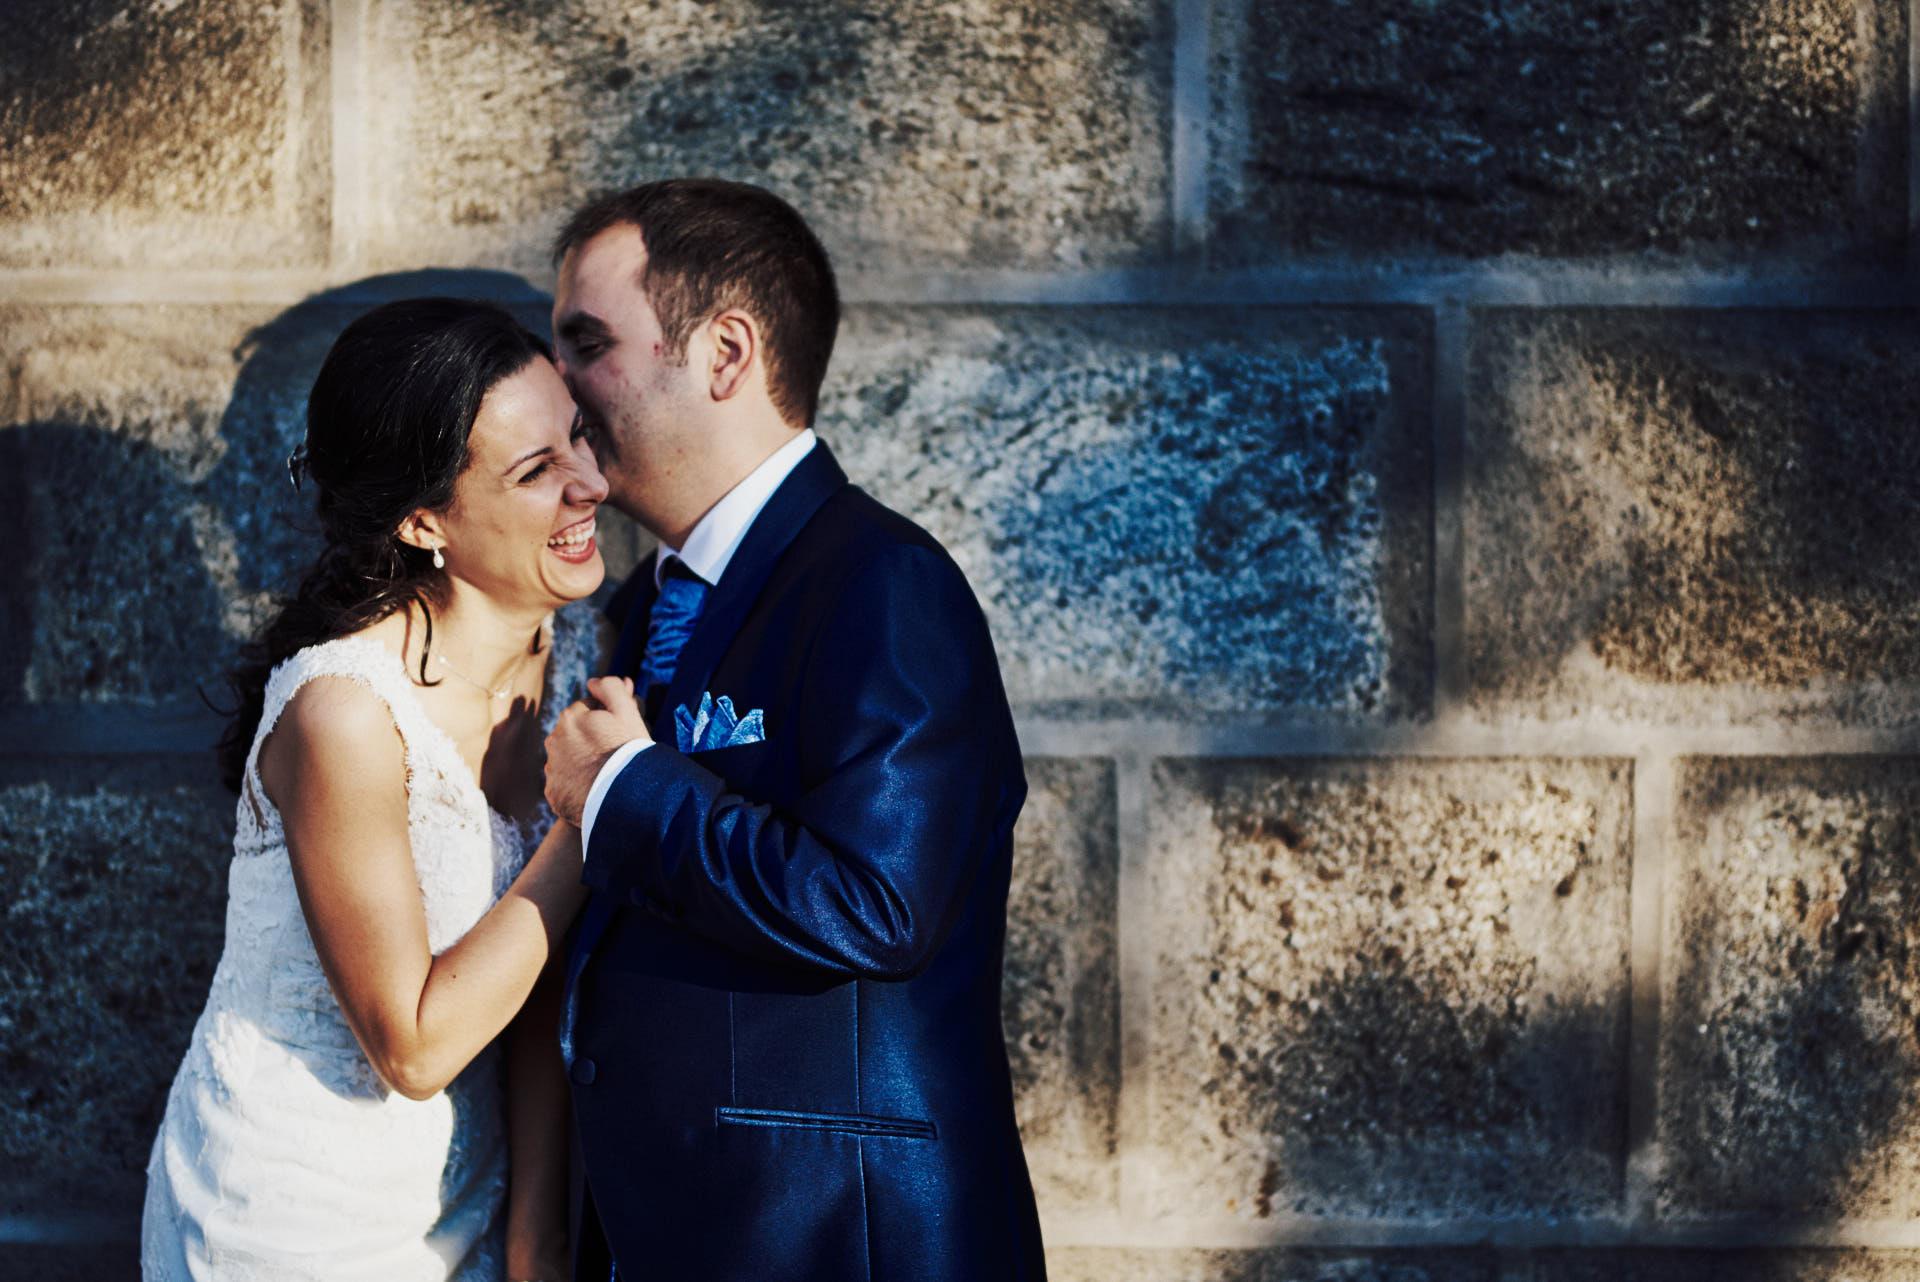 David & Cristina - Postboda en Toledo - José Álvarez Fotografía